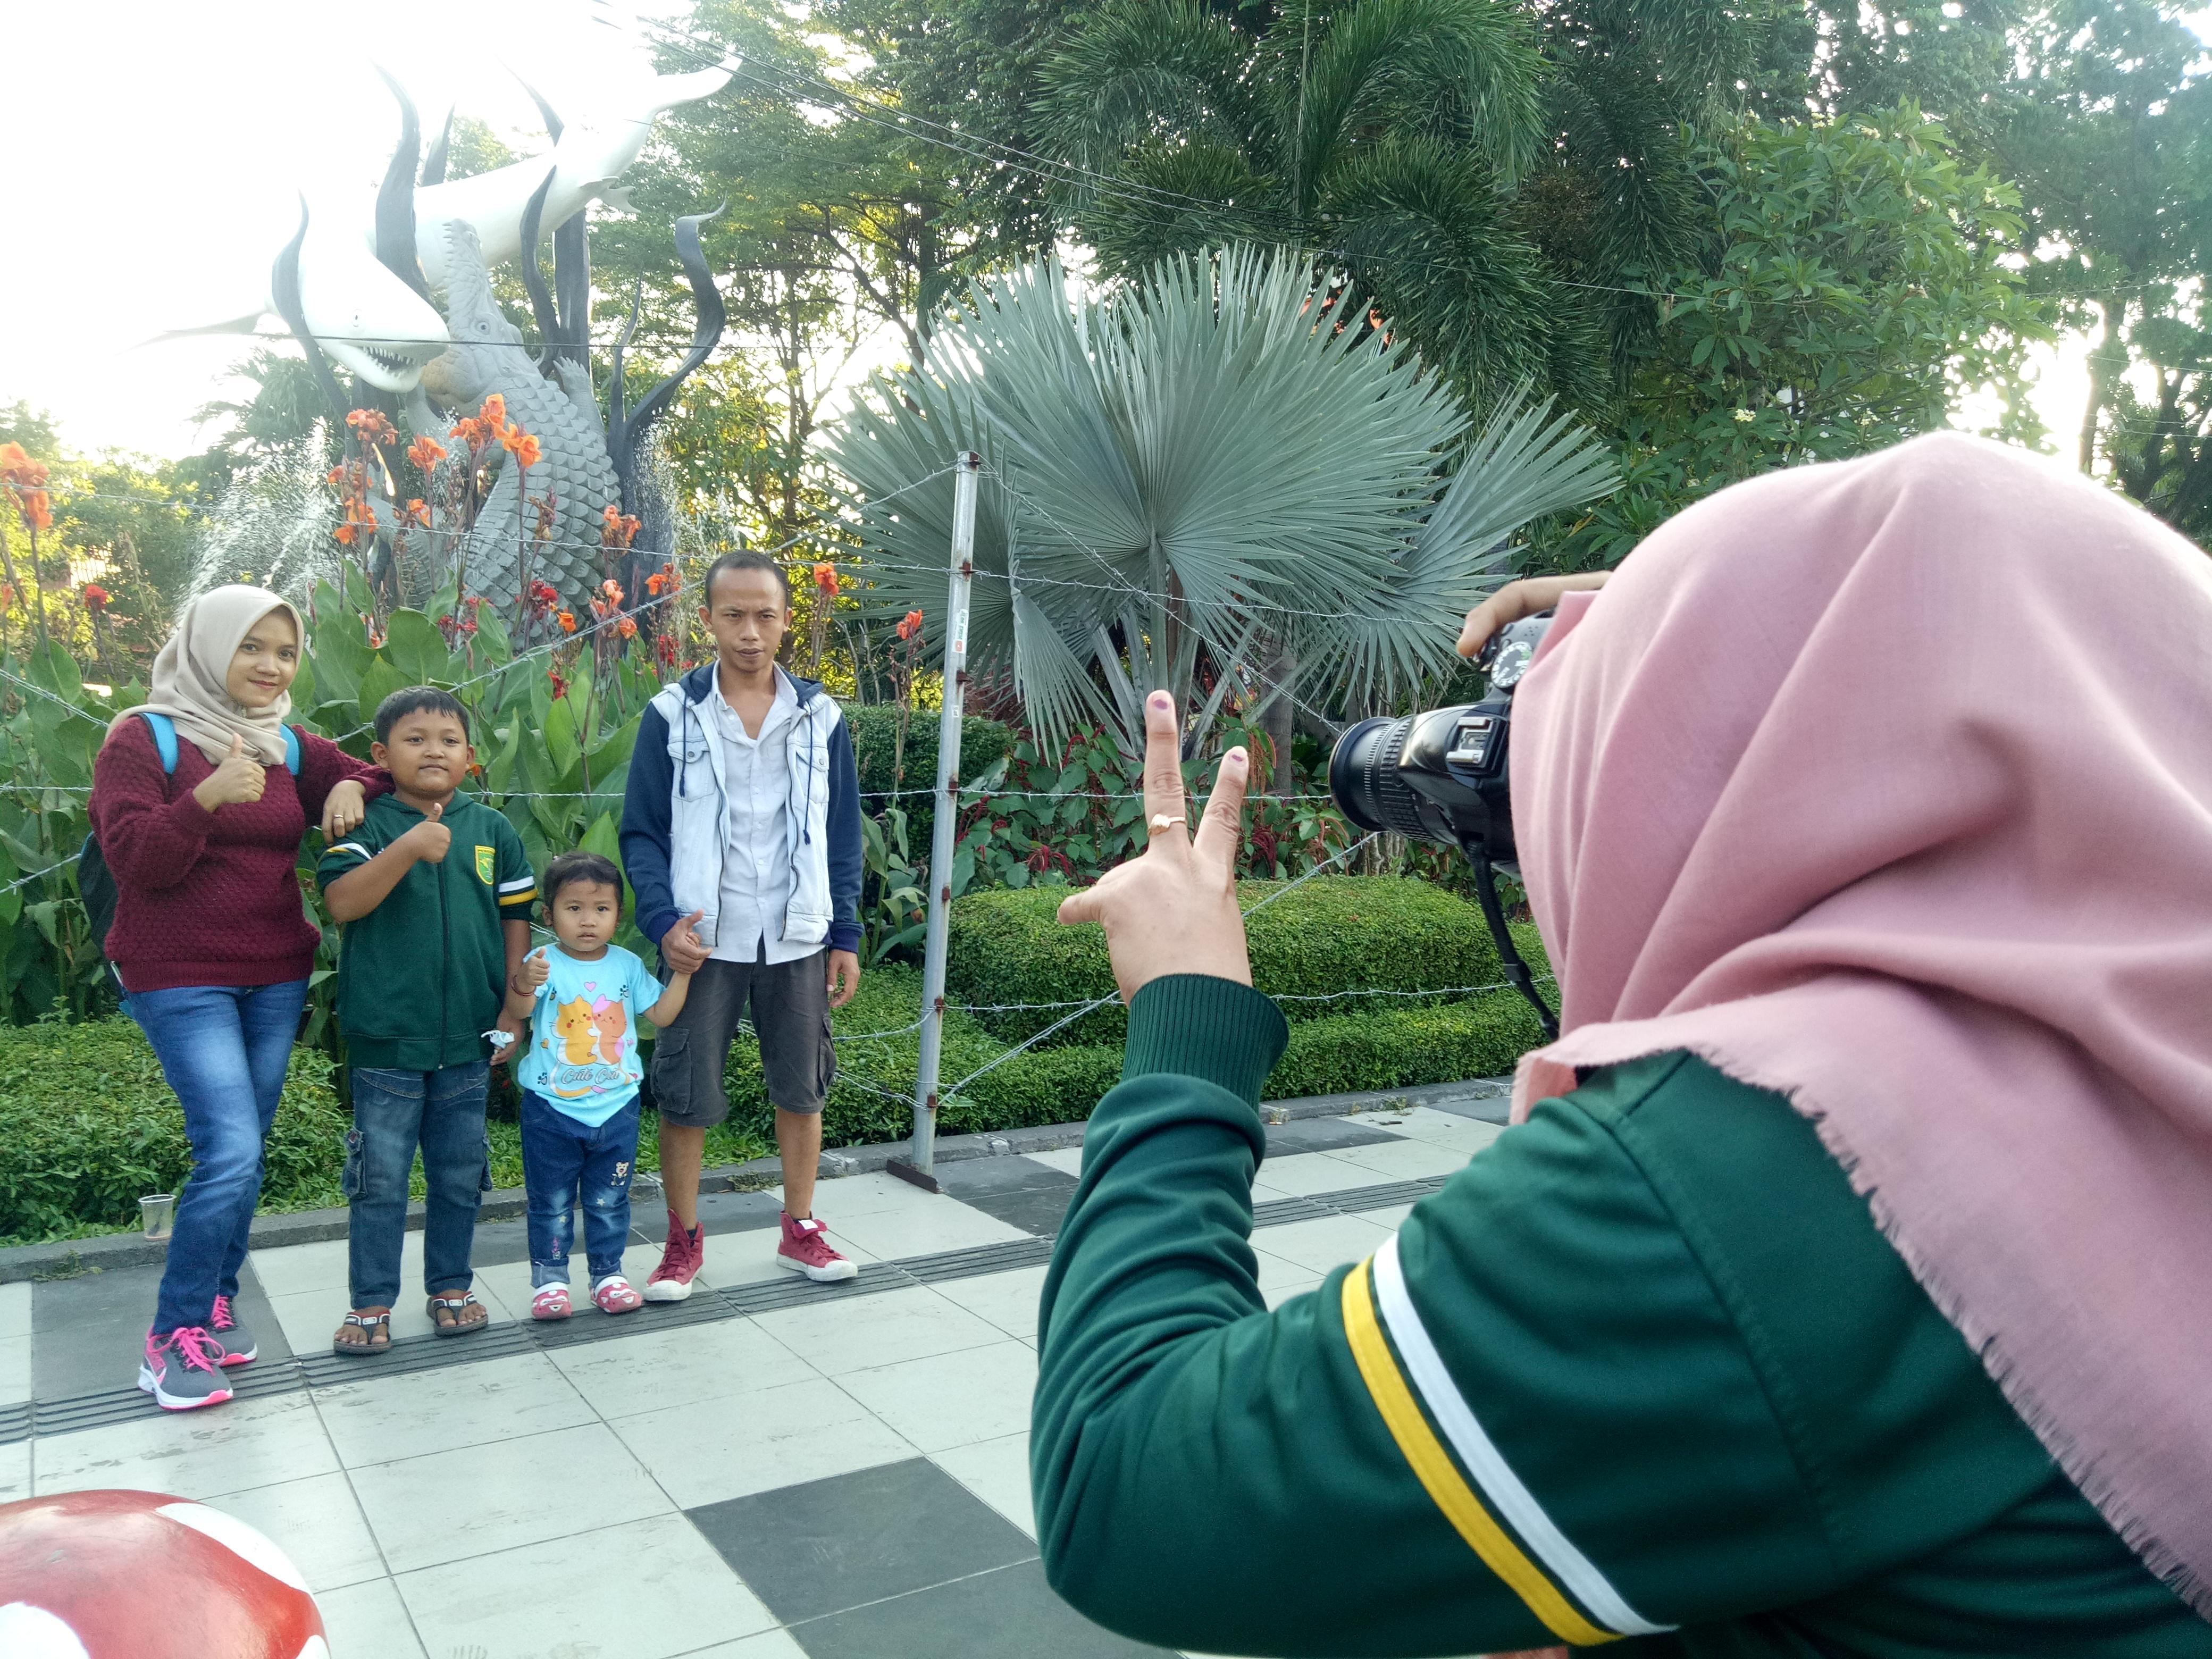 Libur Lebaran Jadi Berkah Para Juru Foto di Depan KBS